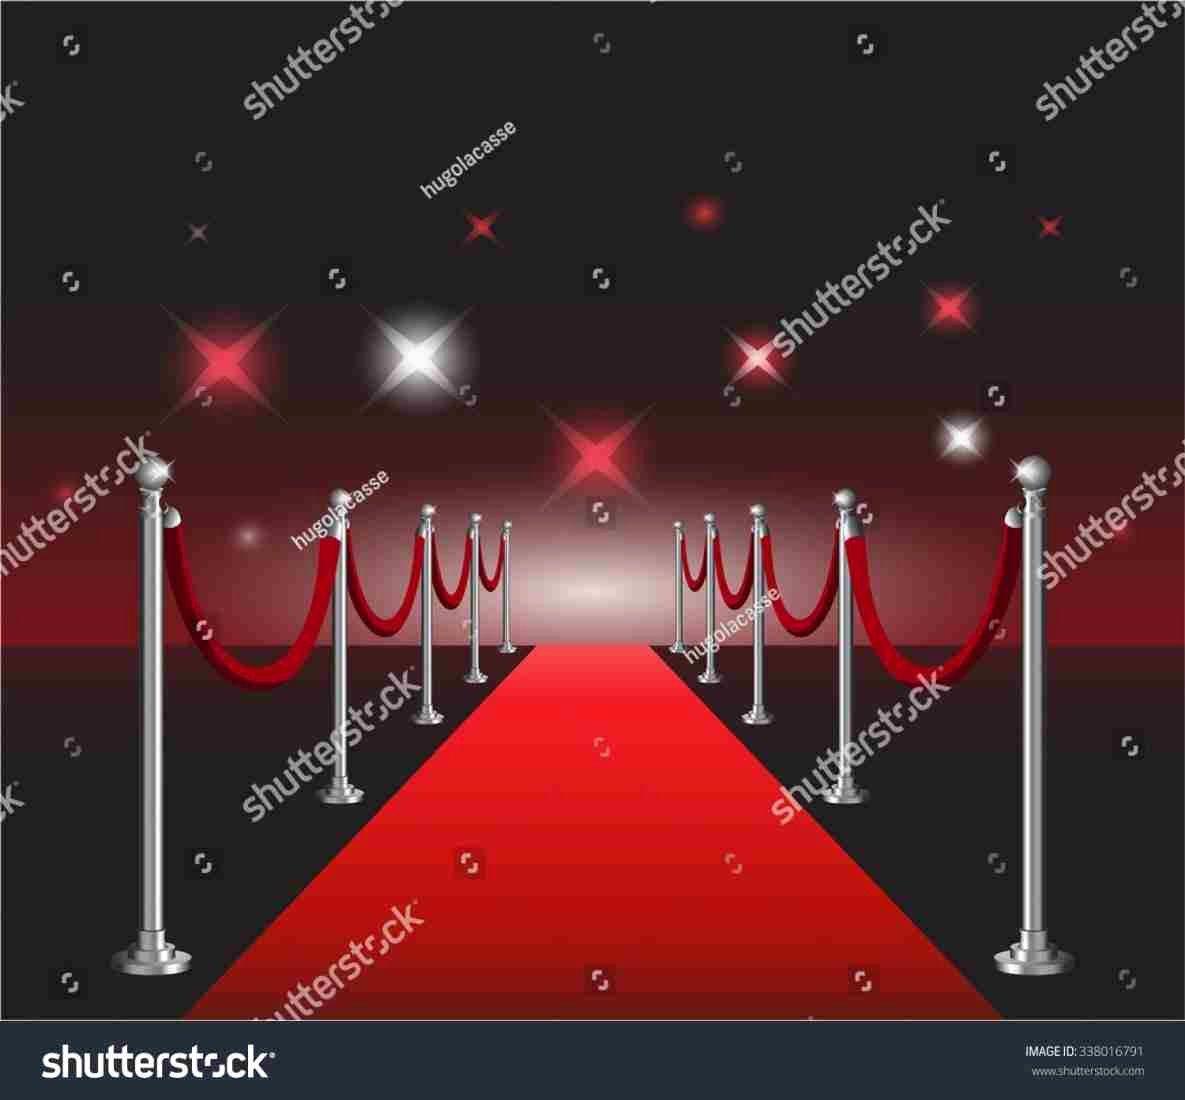 Red Carpet Backdrop Template Elegant Red Carpet Background Banner Homedesignlatestte